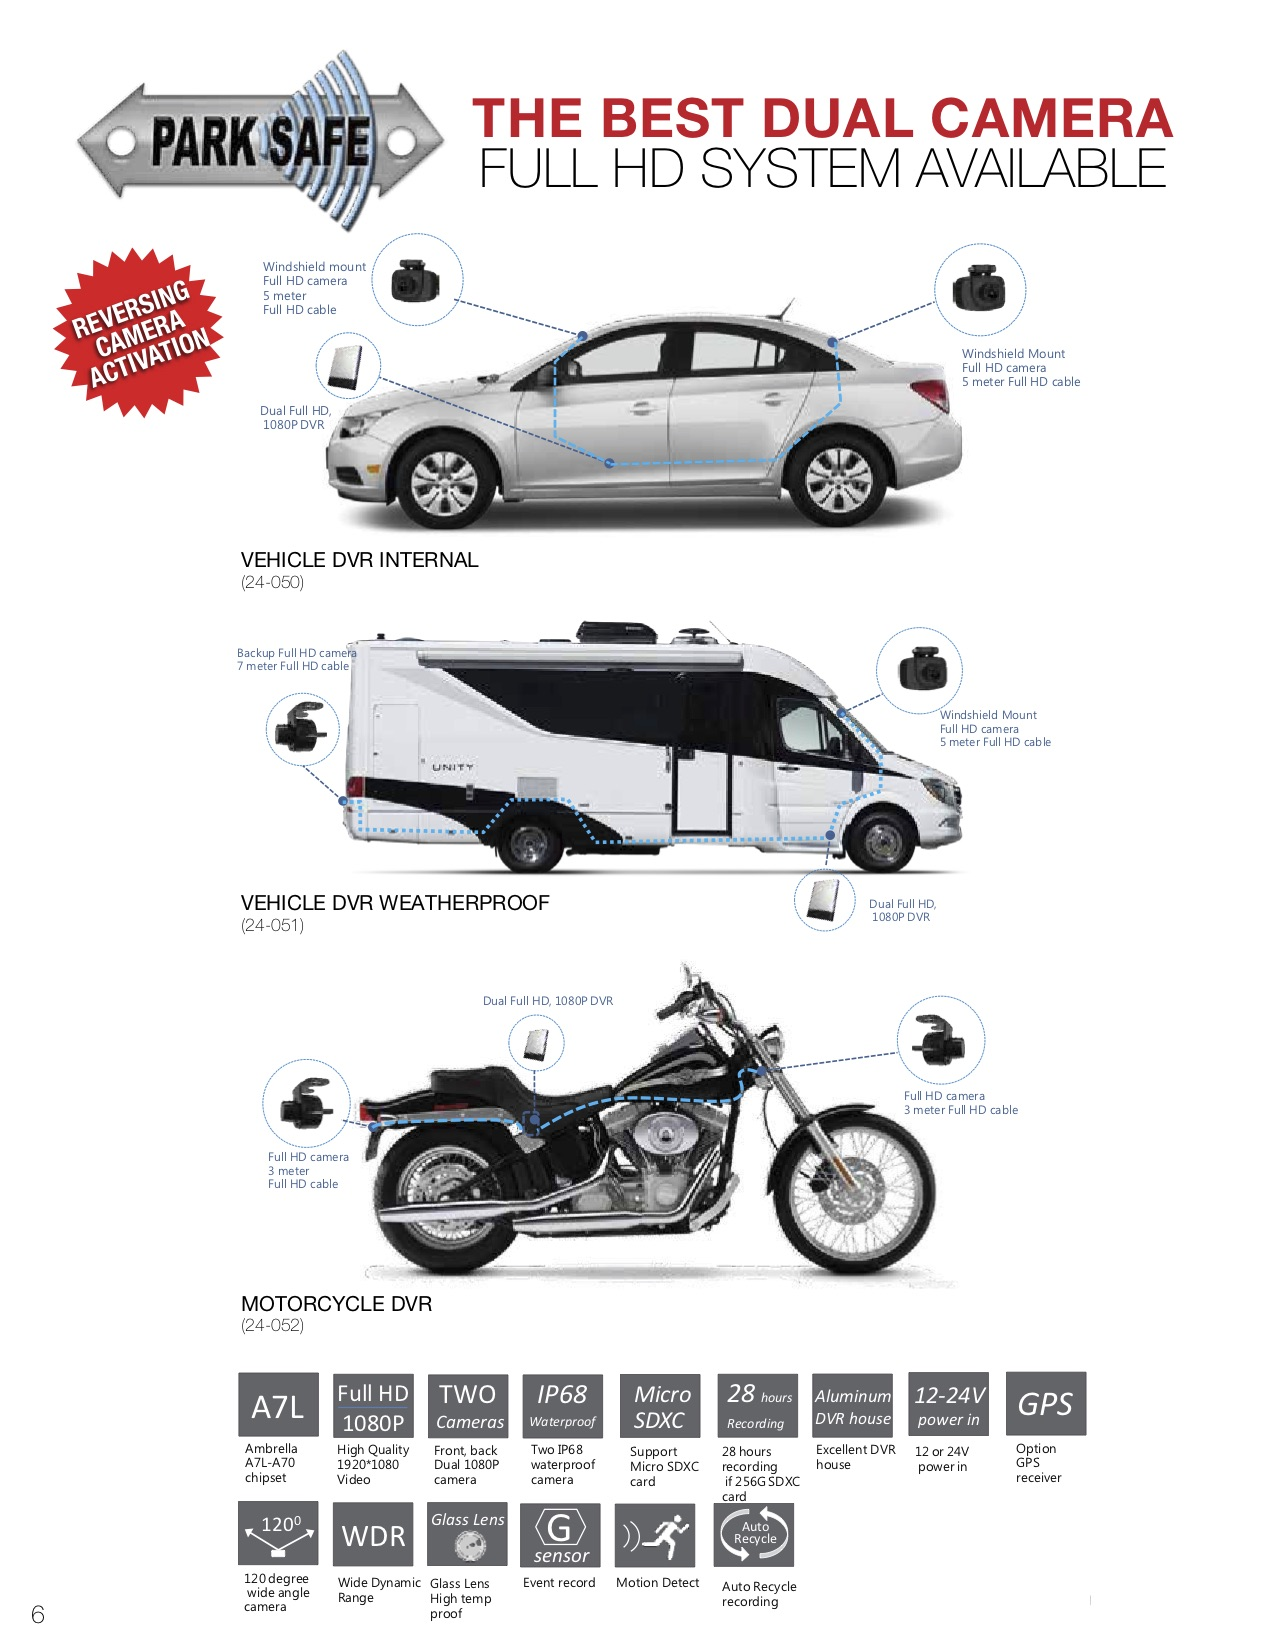 2015 Catalogue - Page 6 - edit - PROOF.jpg